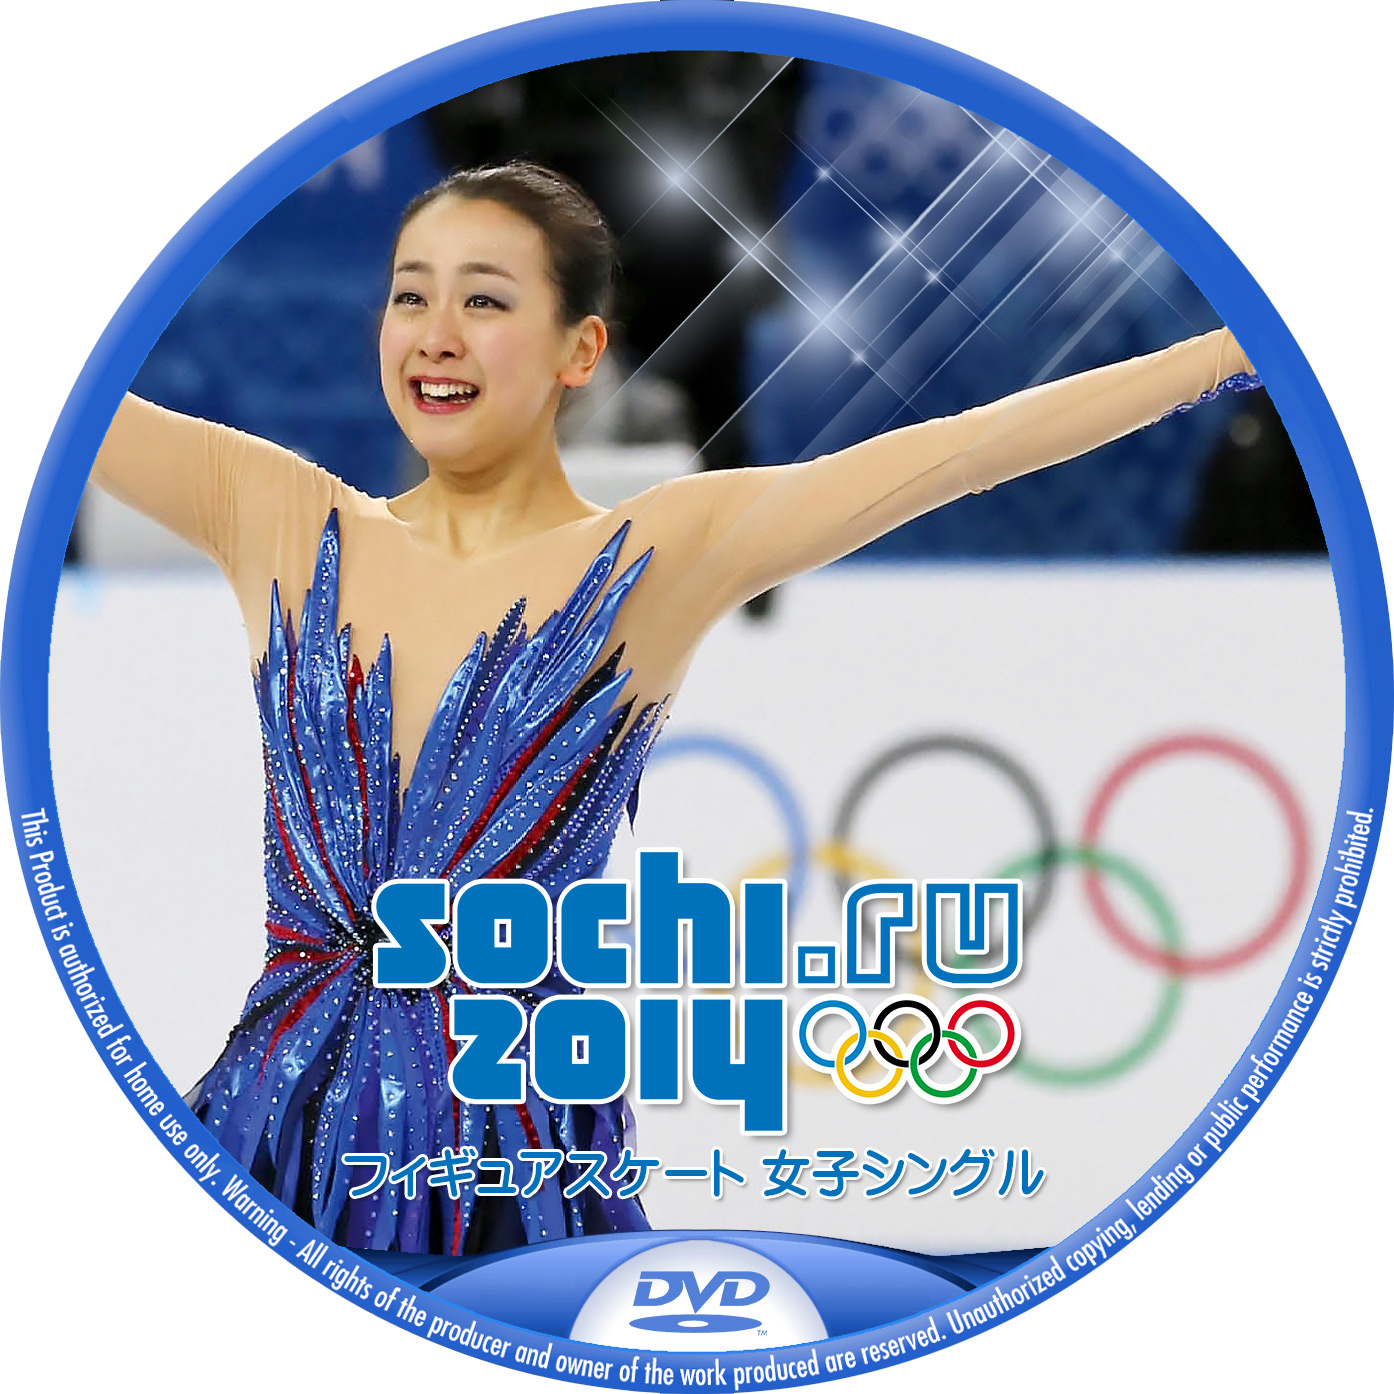 Sochi_Figure_Woens-DVD1